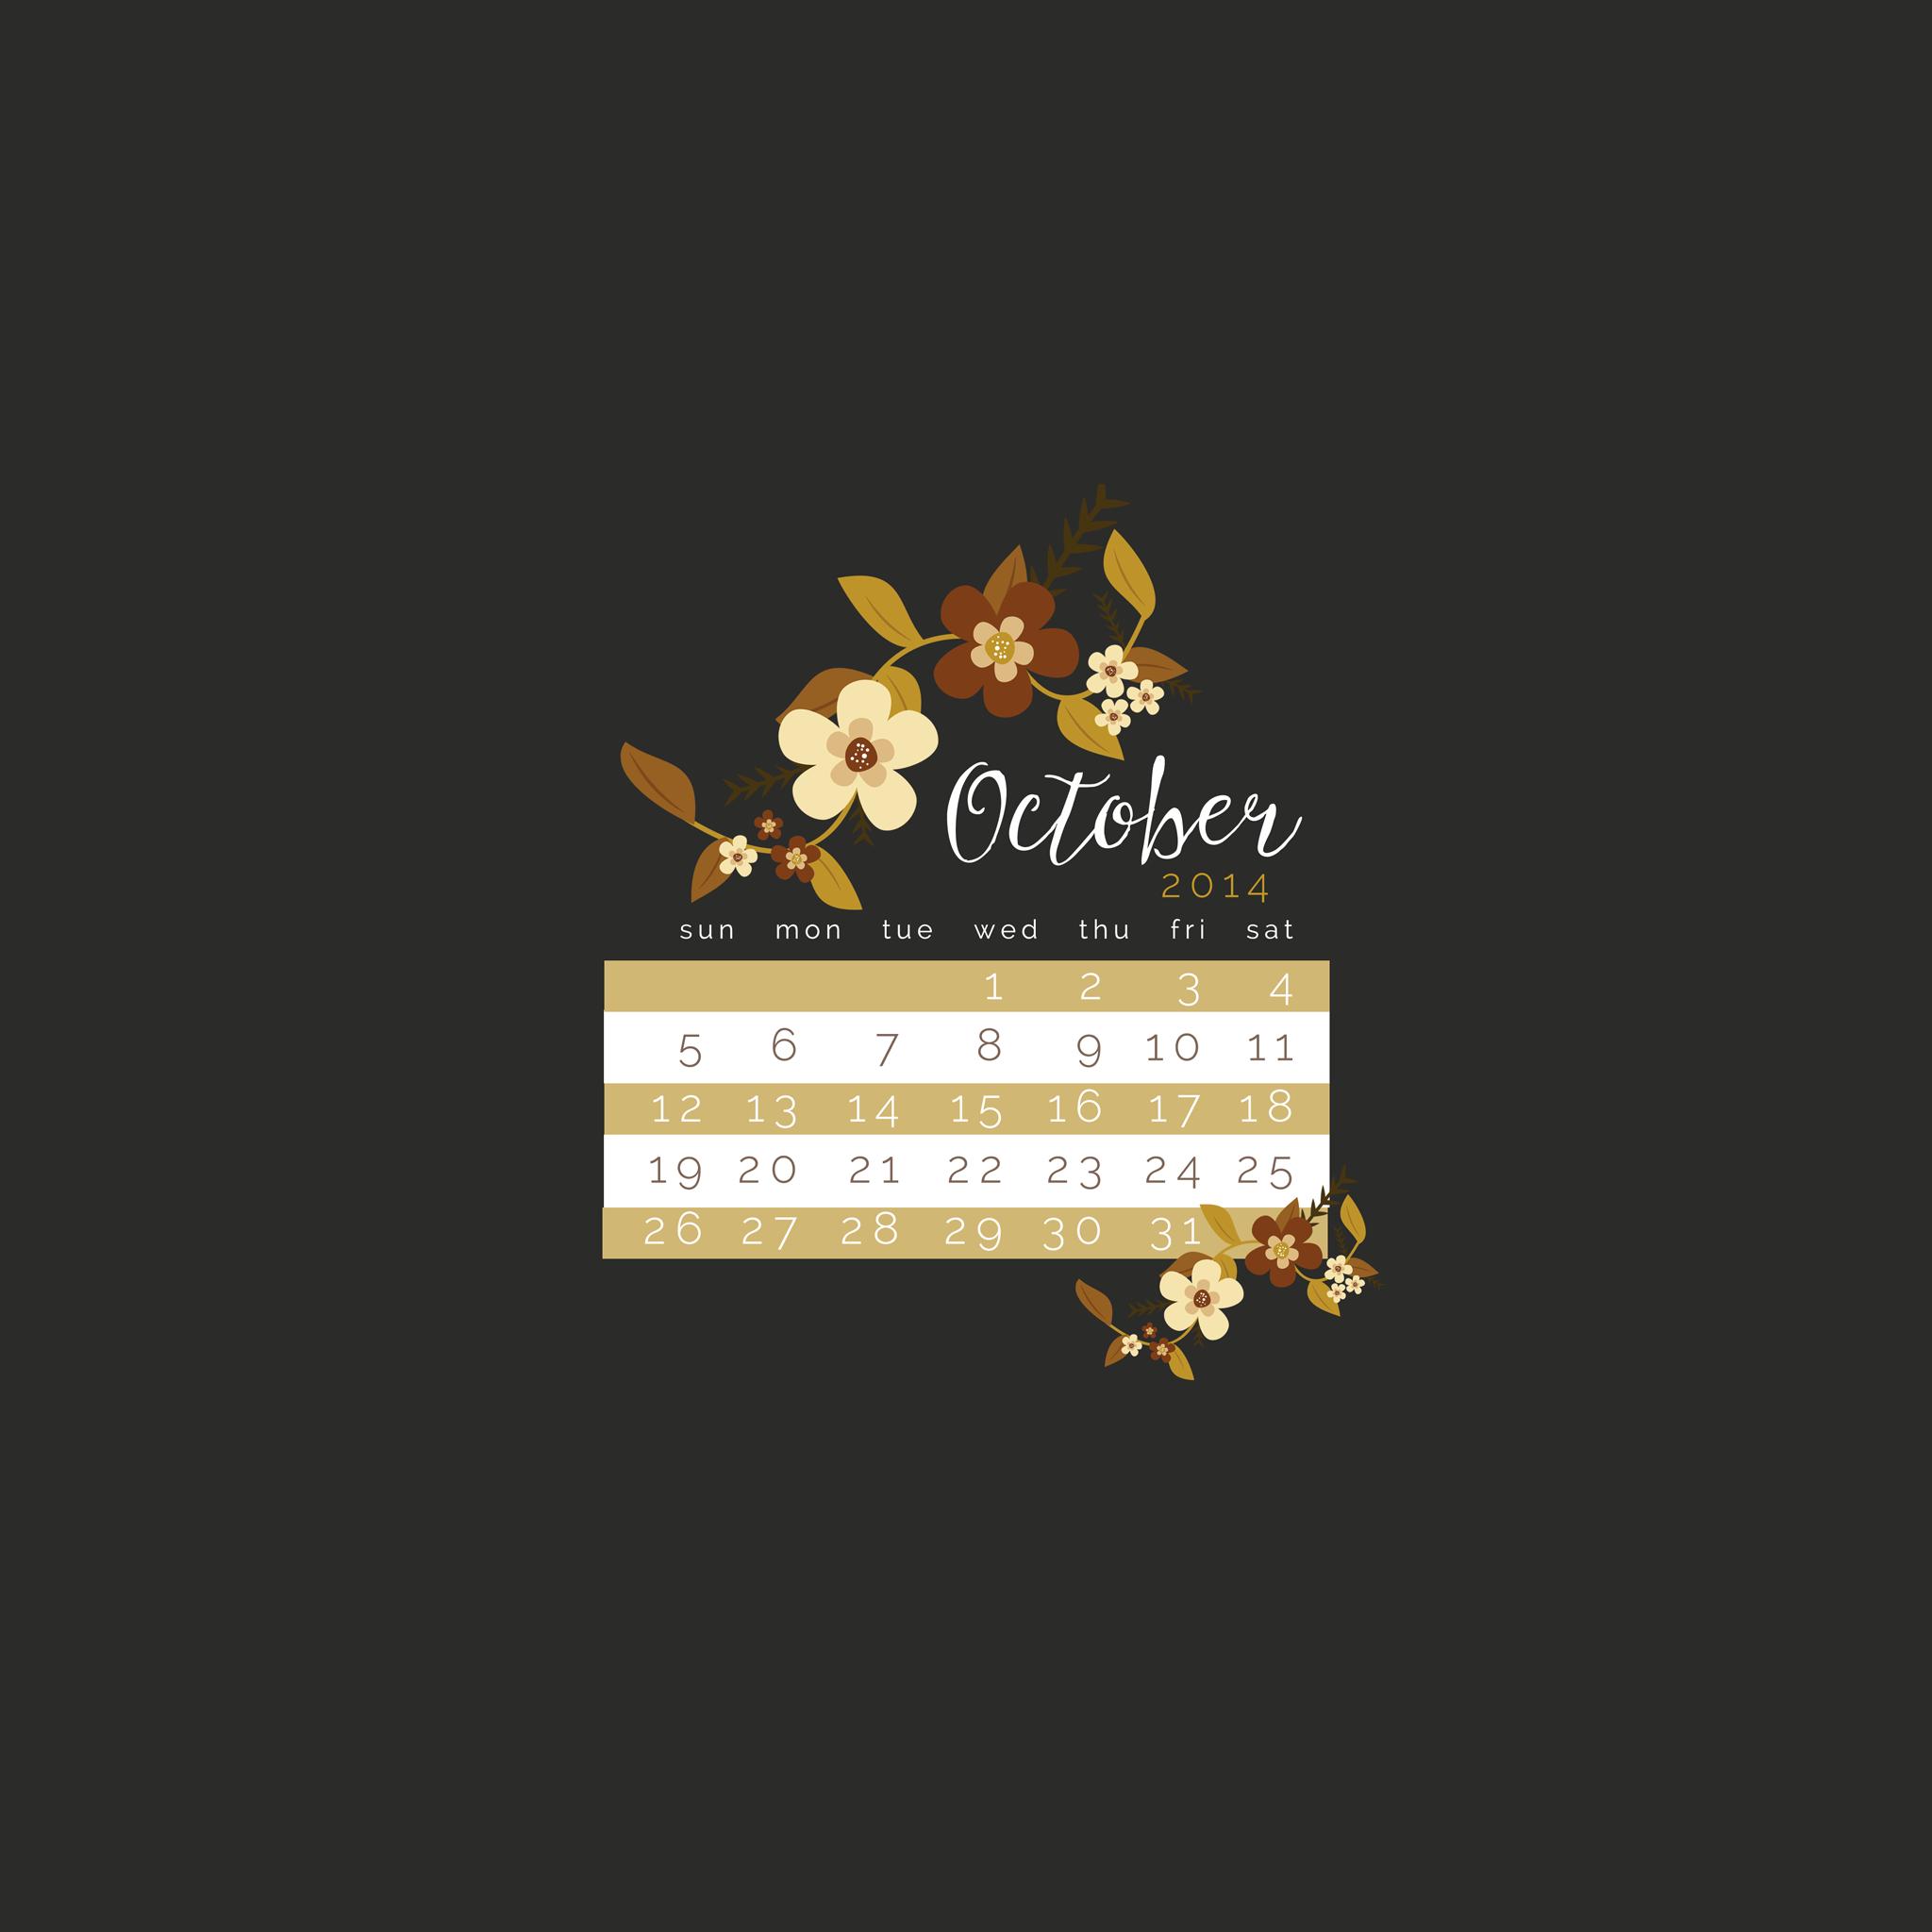 Calendar Lockscreen : October freebie calendar lock screen wallpaper